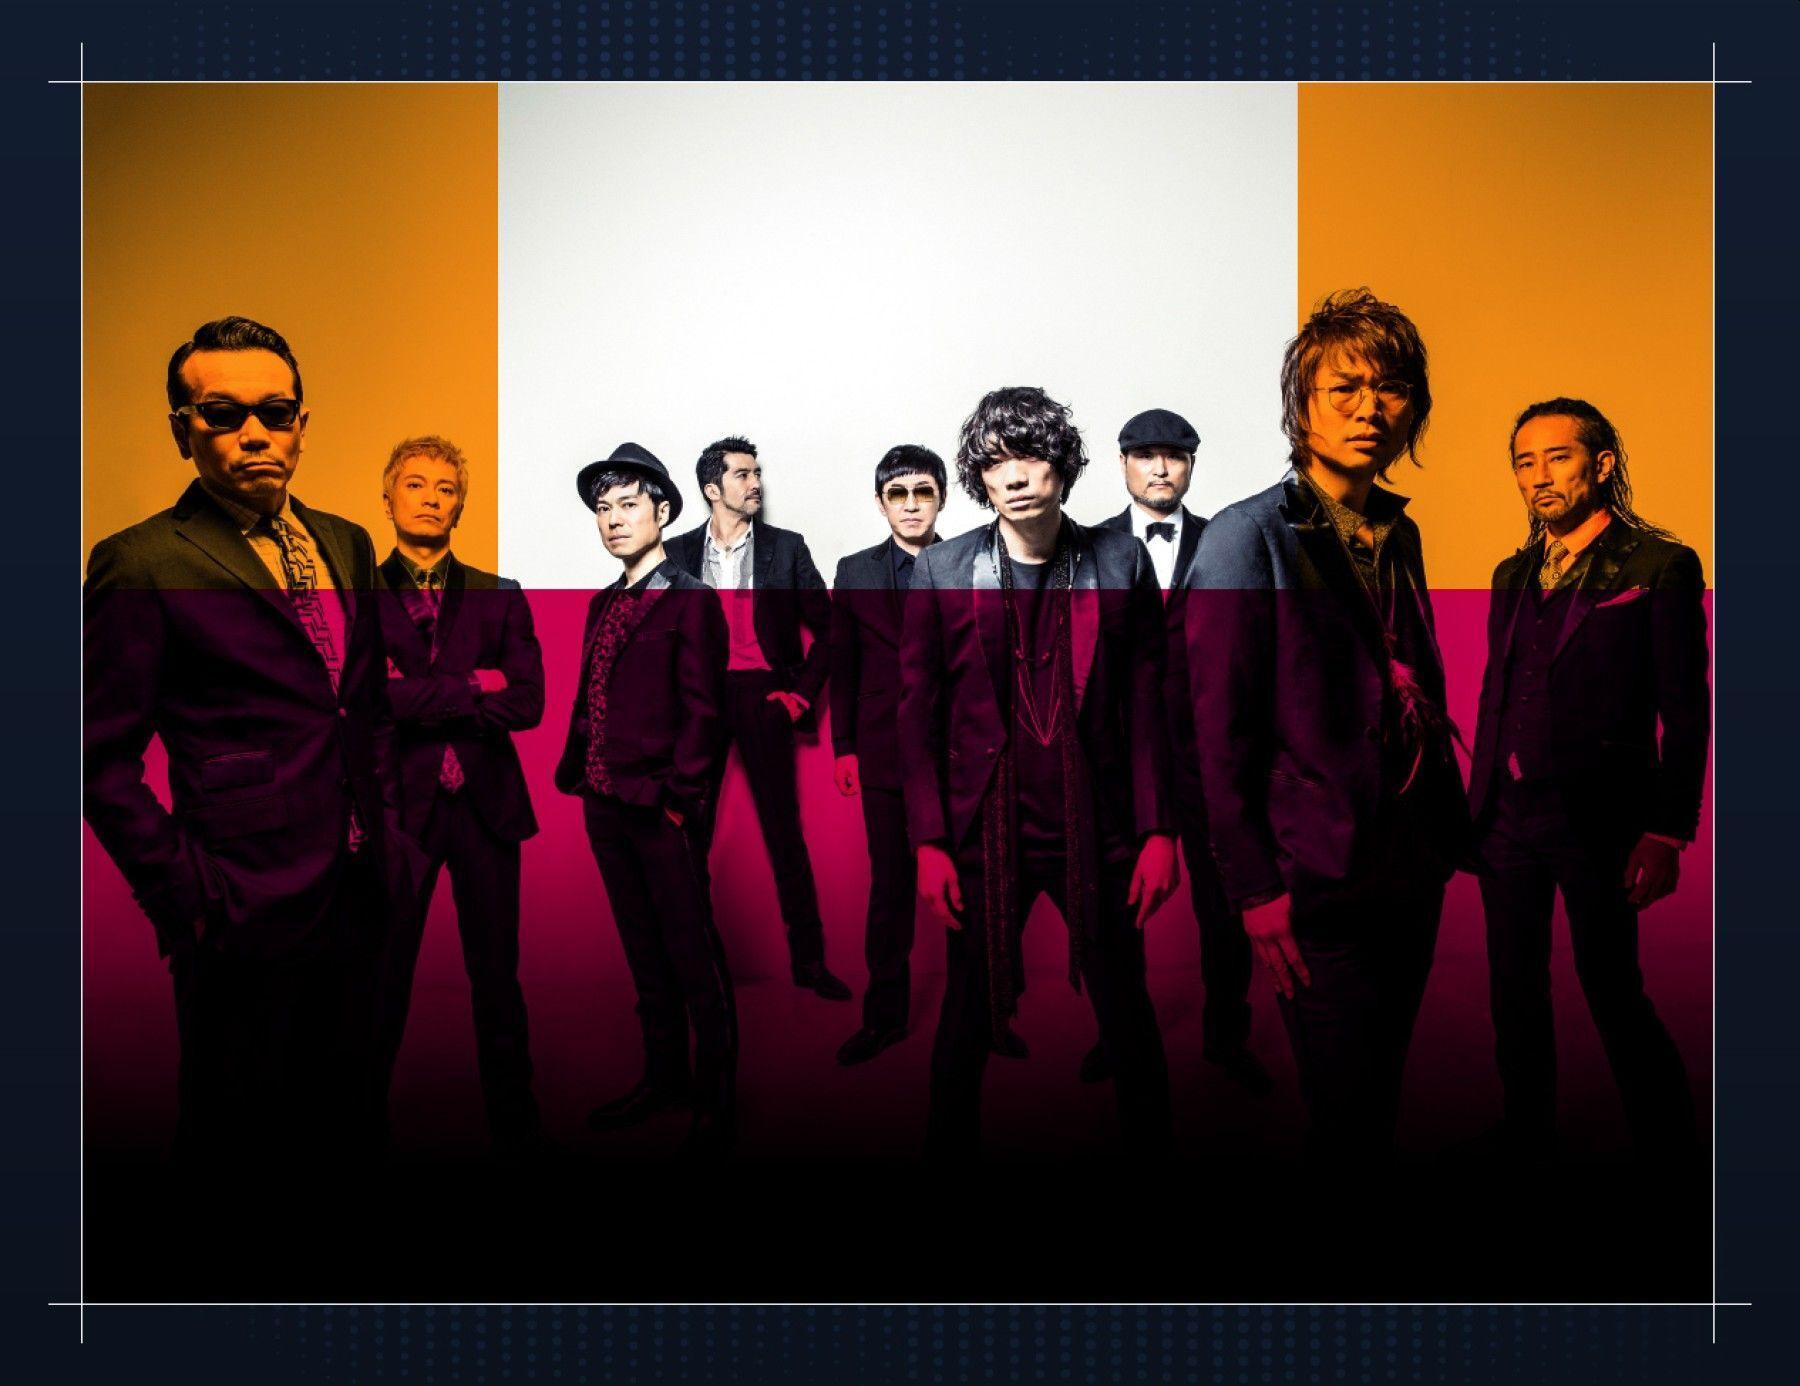 artist: Tokyo Ska Paradise Orchestra